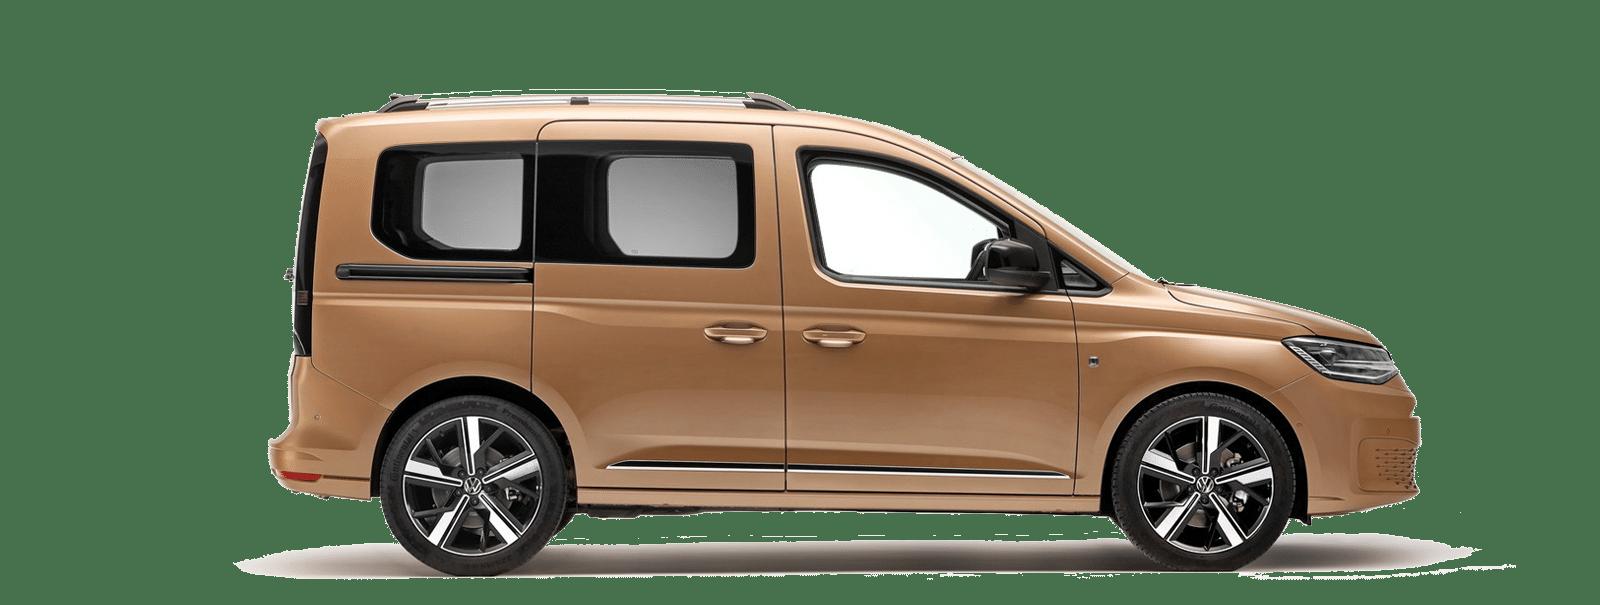 Nuovo Volkswagen Caddy Napoli